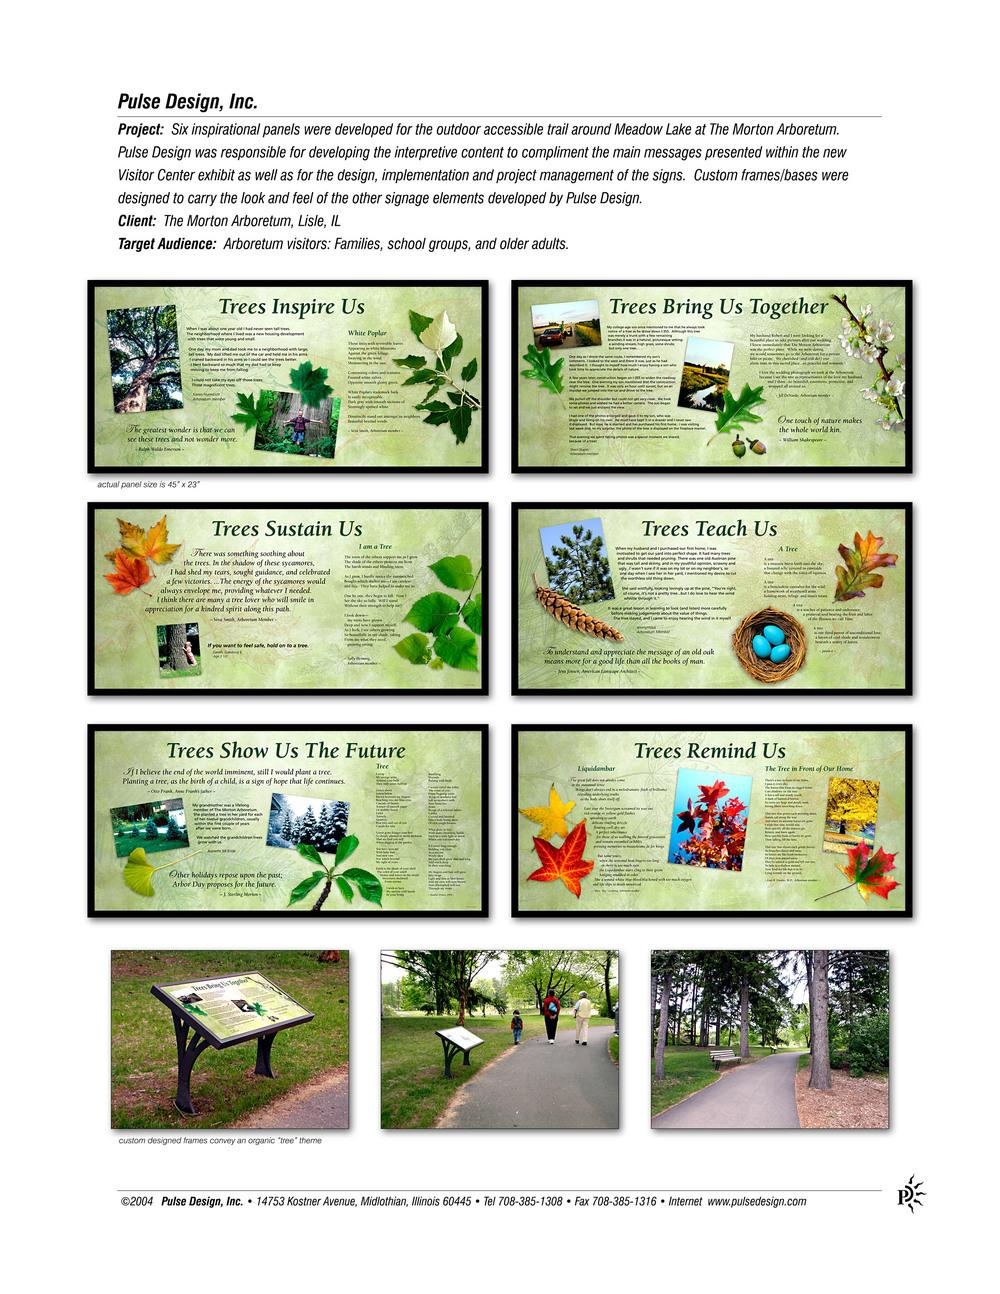 Morton-Arboretum-Meadow-Lake-Trail-Signs-Pulse-Design-Inc.jpg